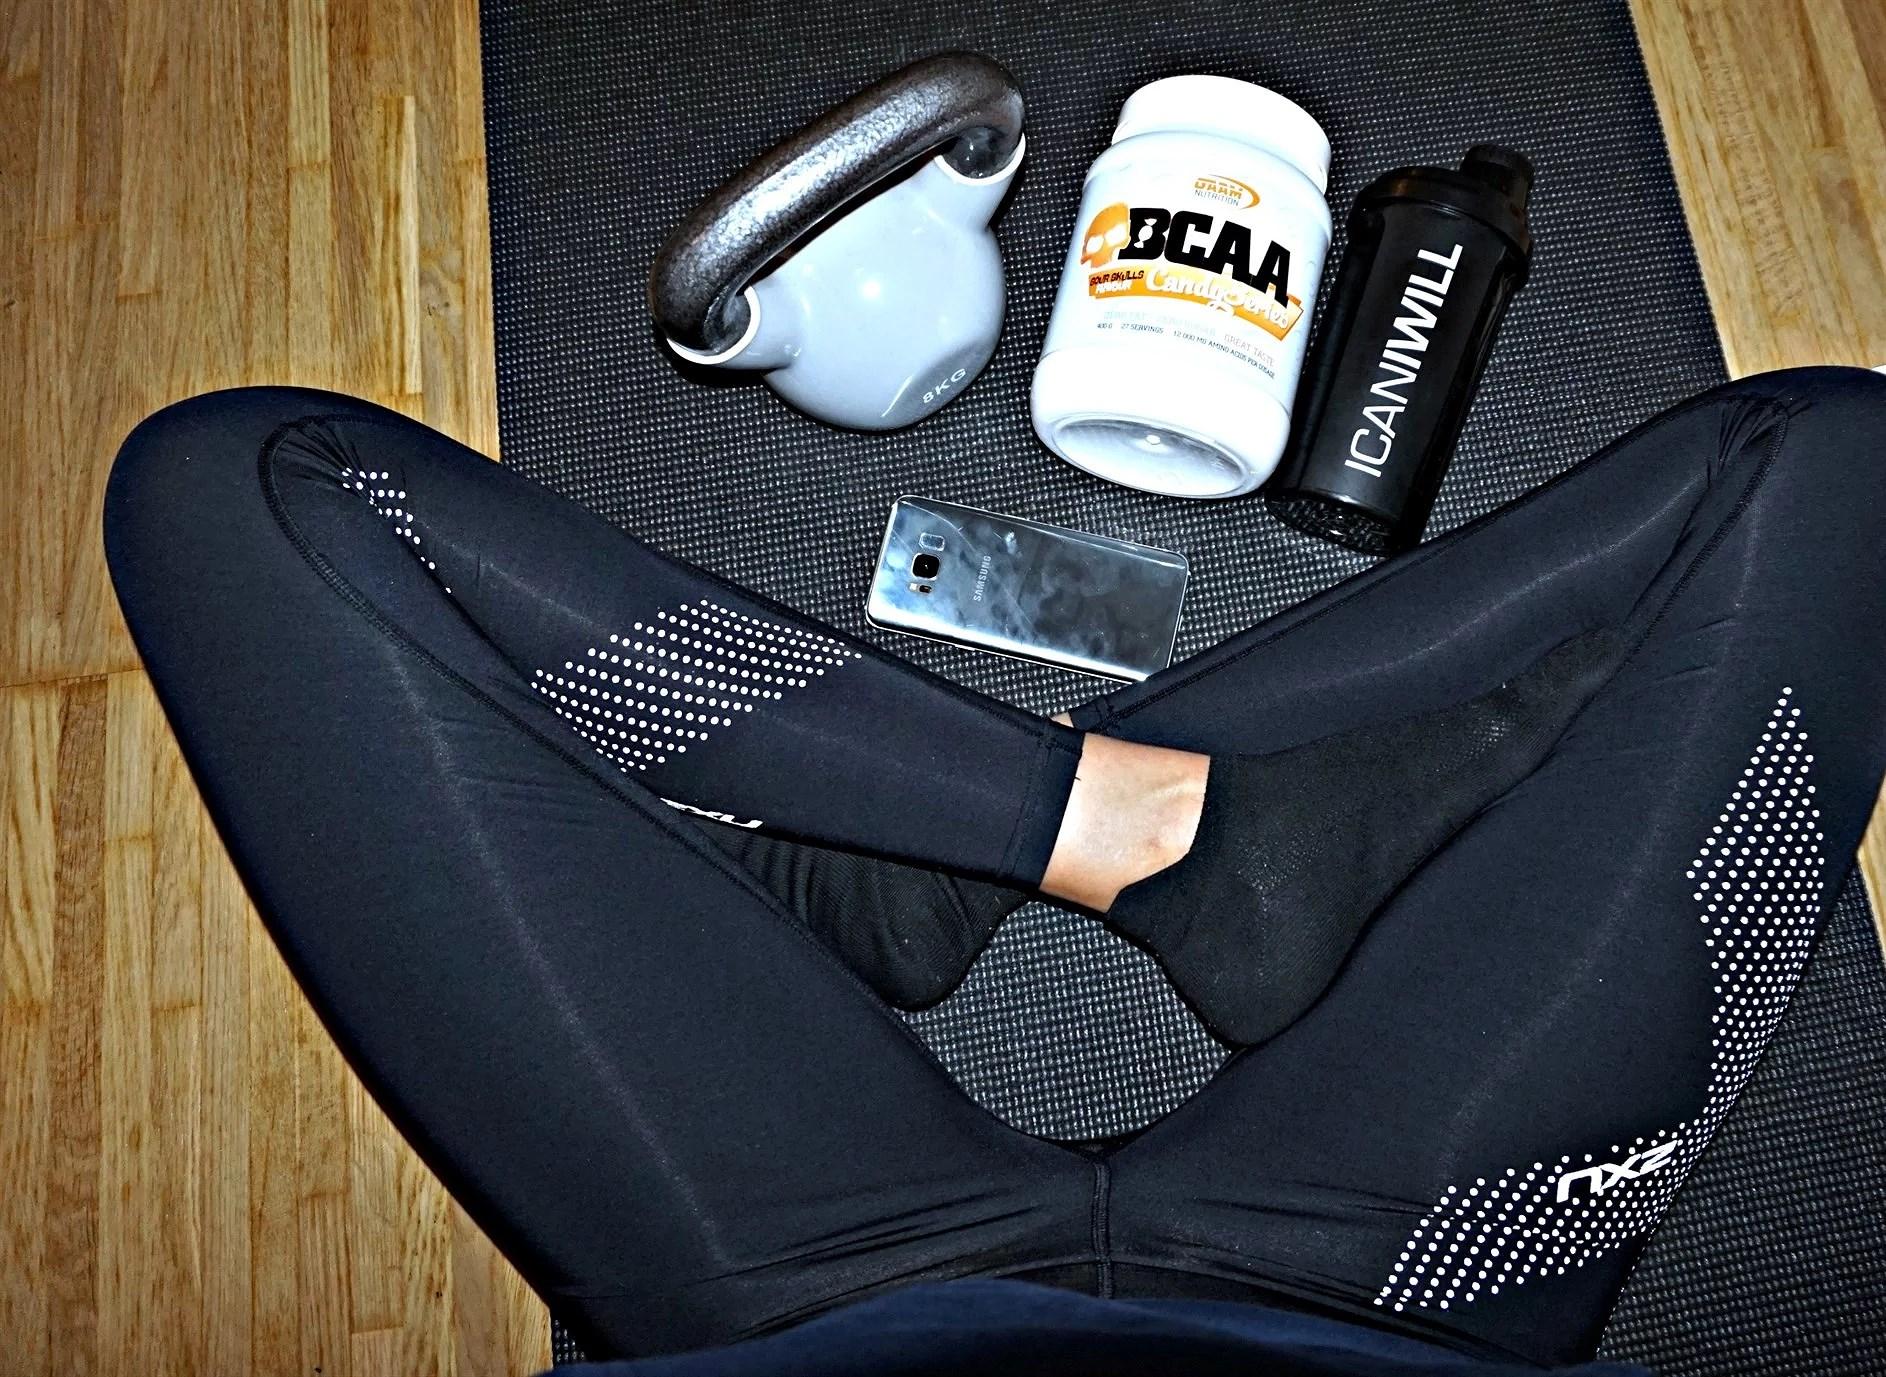 Gym eller inte? -